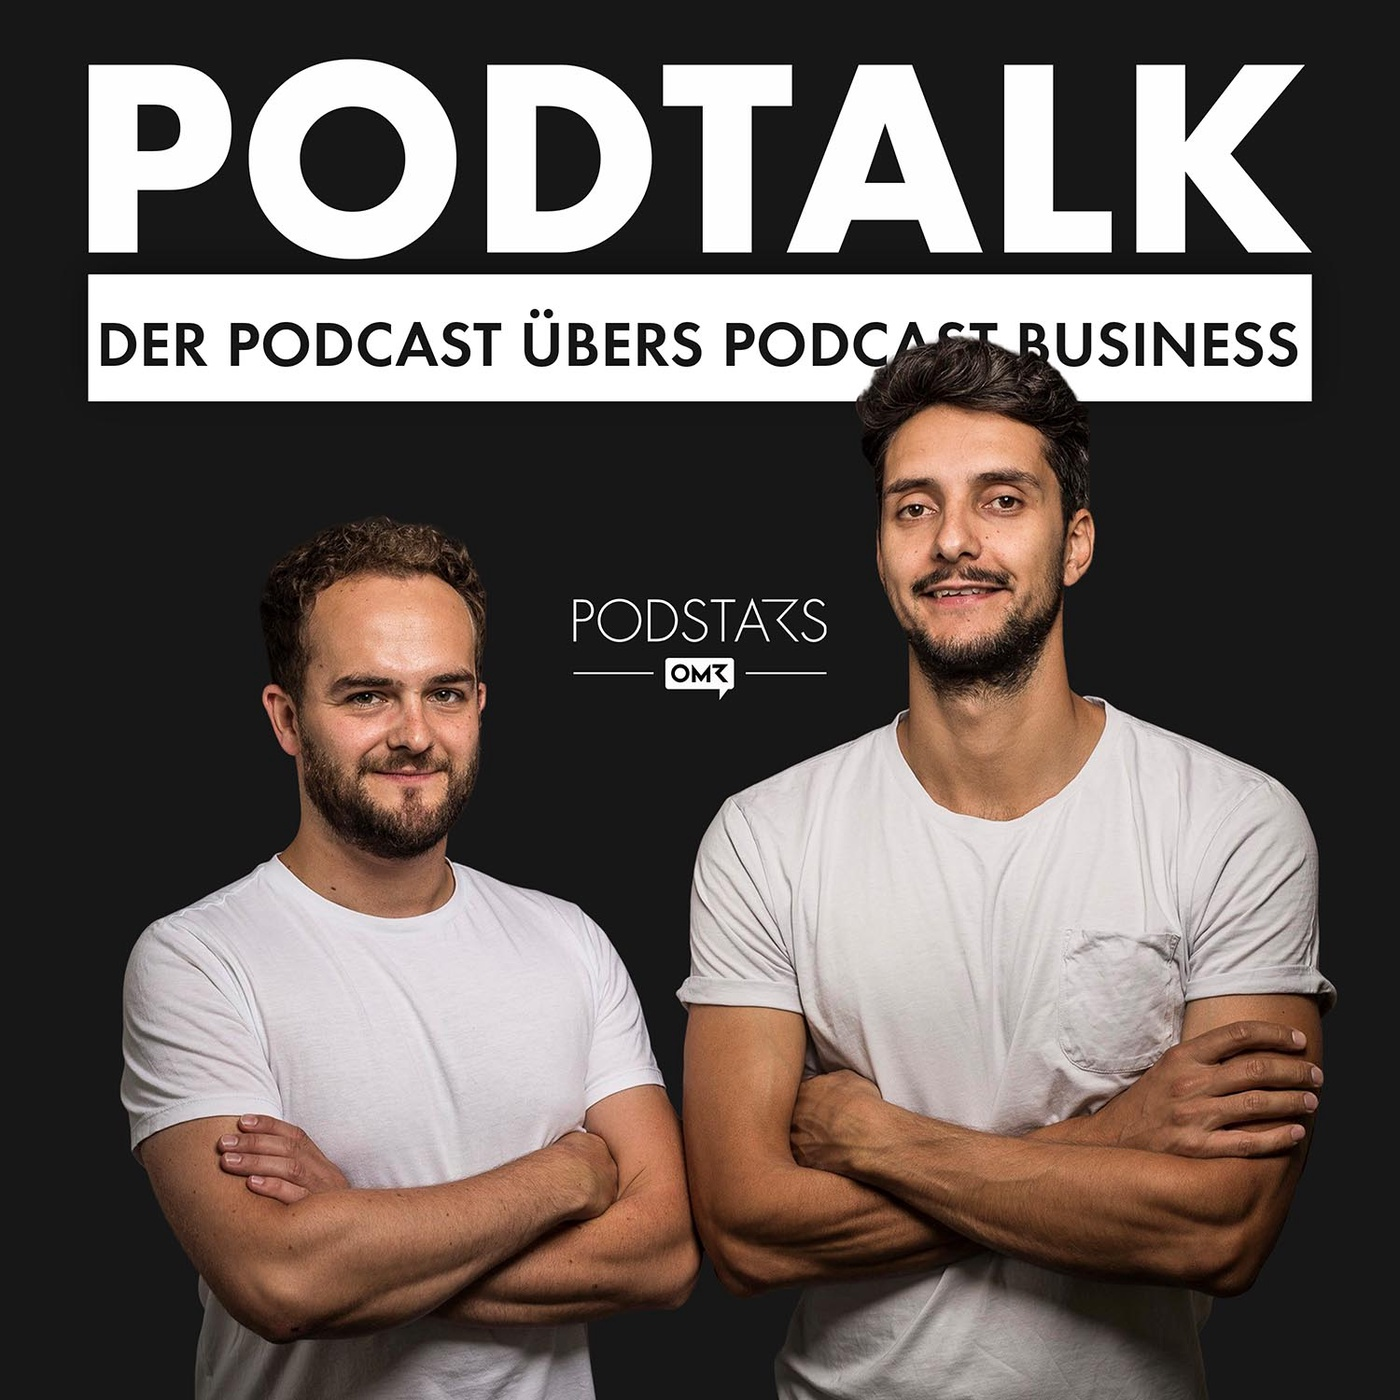 PodTalk #21 Die Zukunft des Podcastings: Dynamic Content, der Angriff auf Clubhouse und Paris Hilton